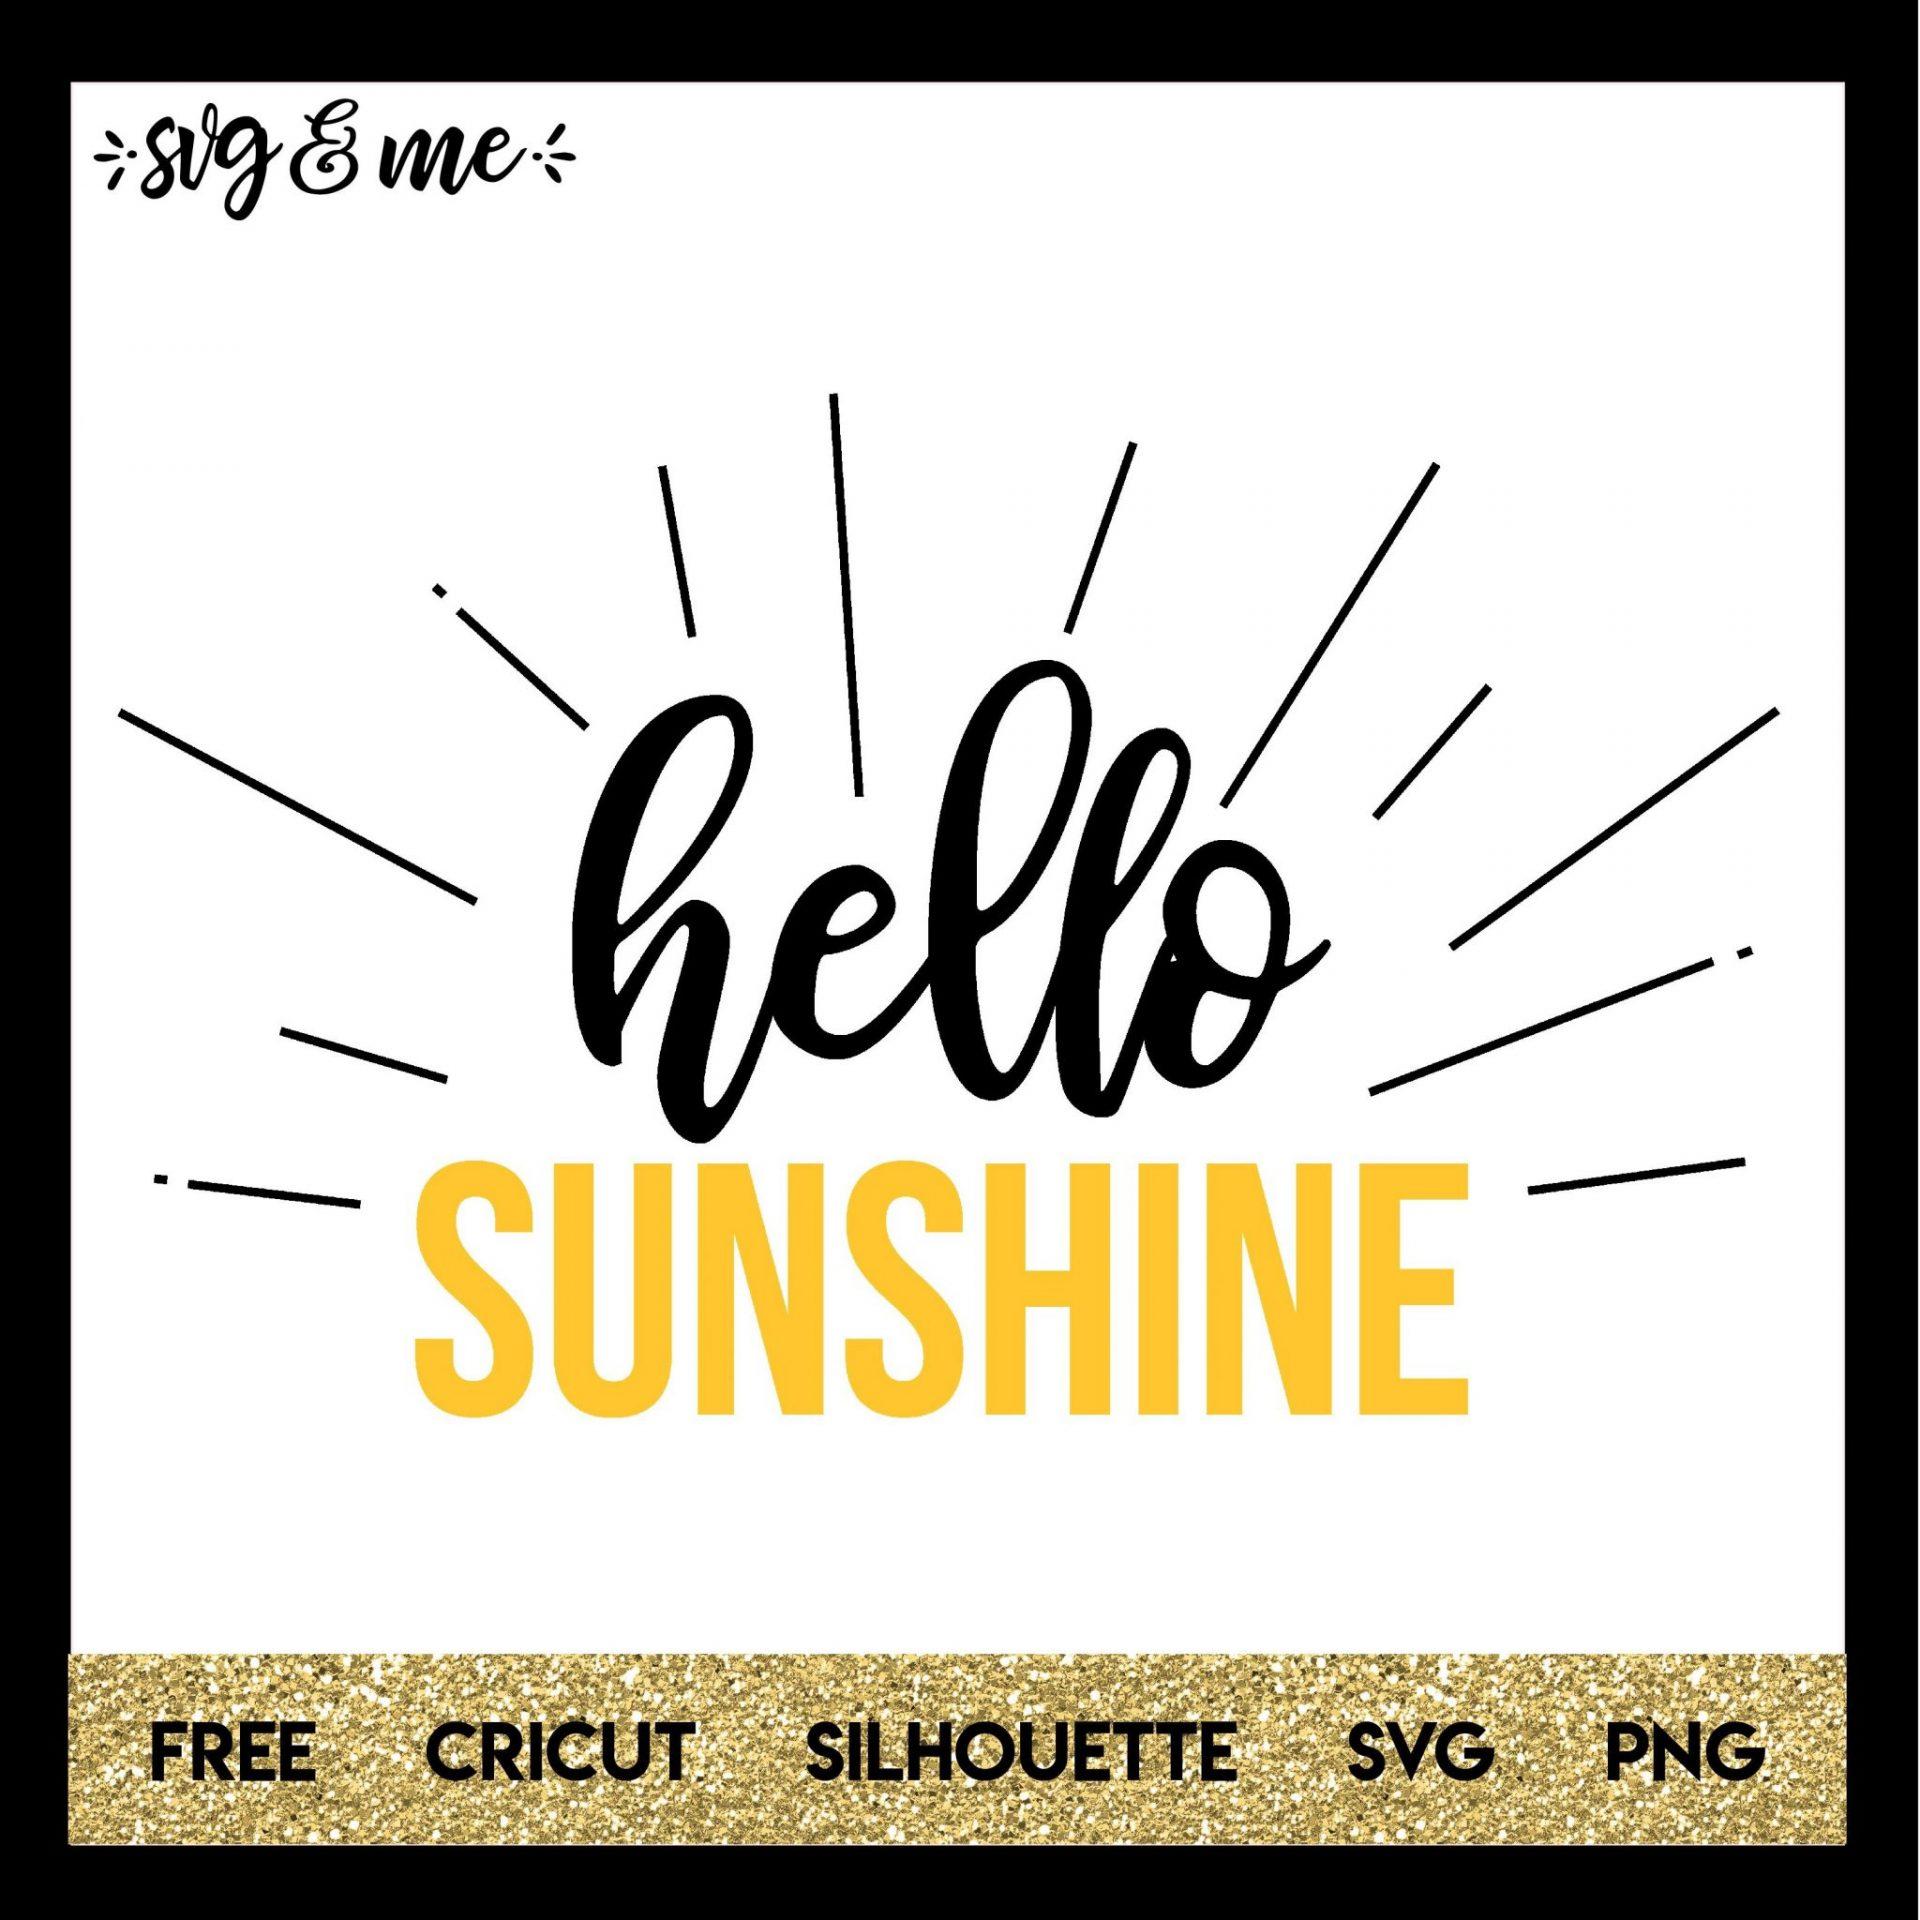 FREE SVG CUT FILE for Cricut, Silhouette and more - Hello Sunshine